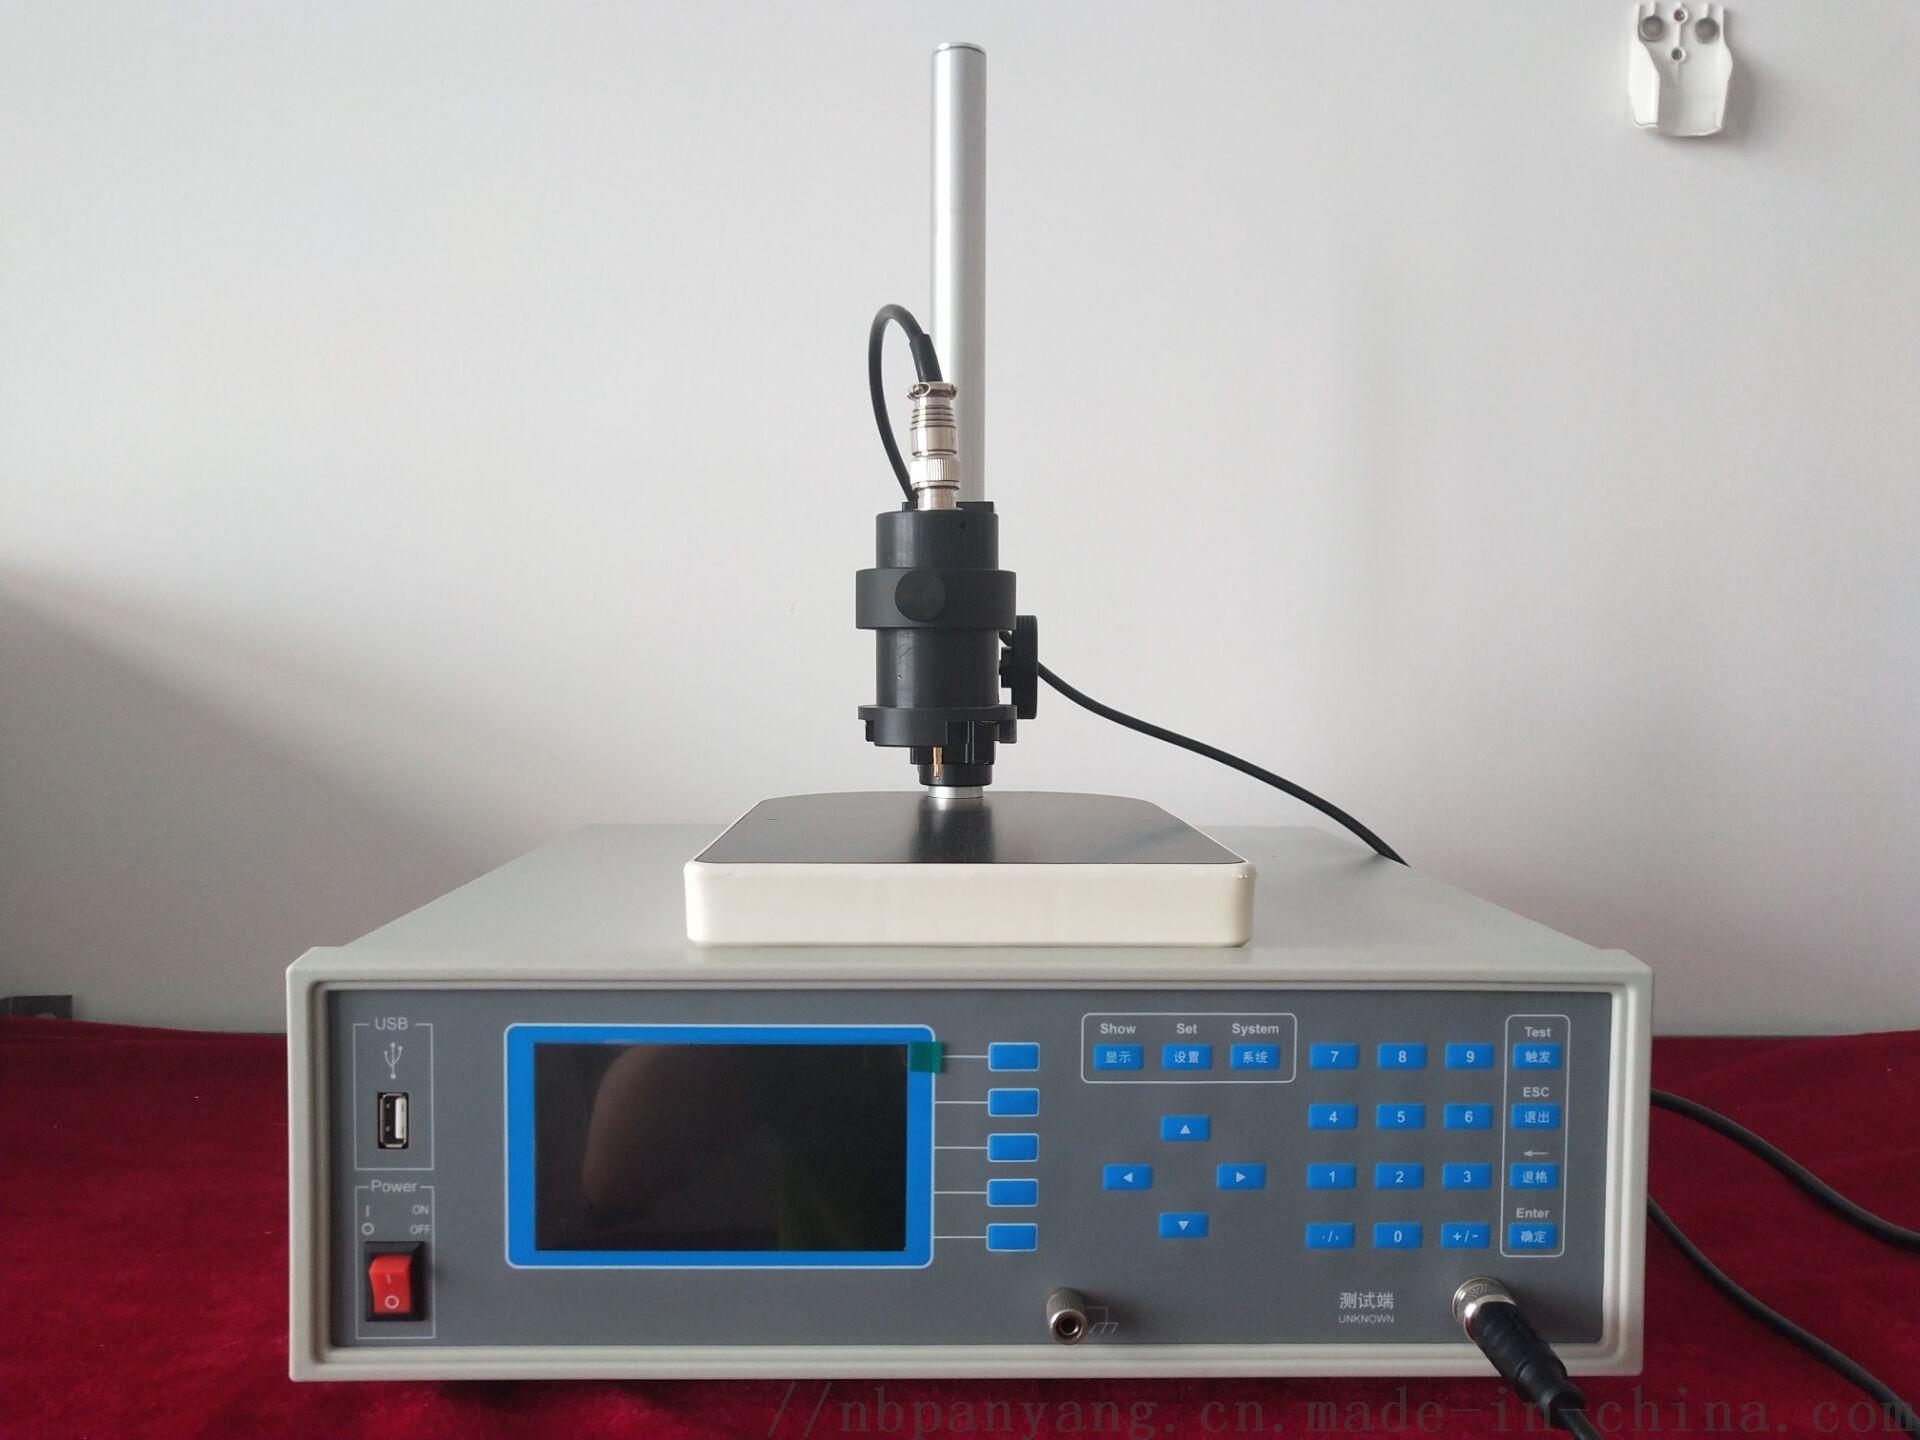 FT-340電測電四探針方阻電阻率測試儀849844515